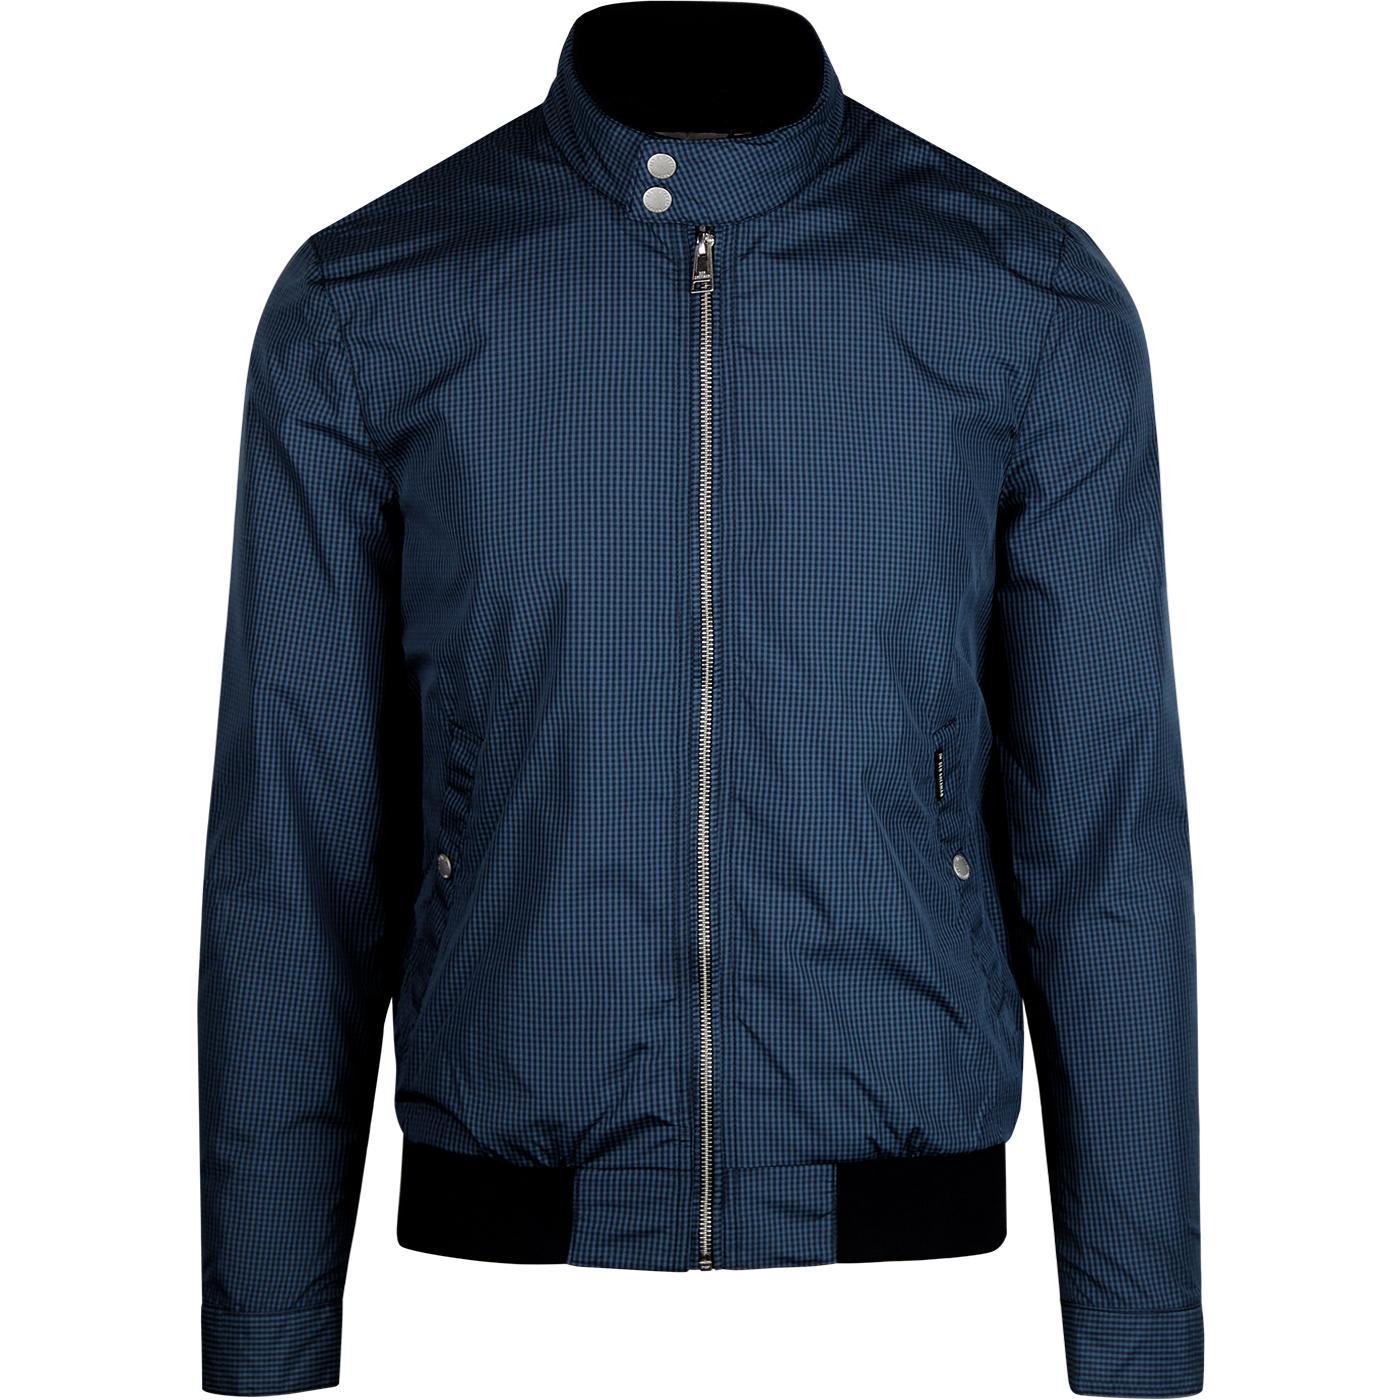 BEN SHERMAN Mens Micro Check Mod Harrington Jacket